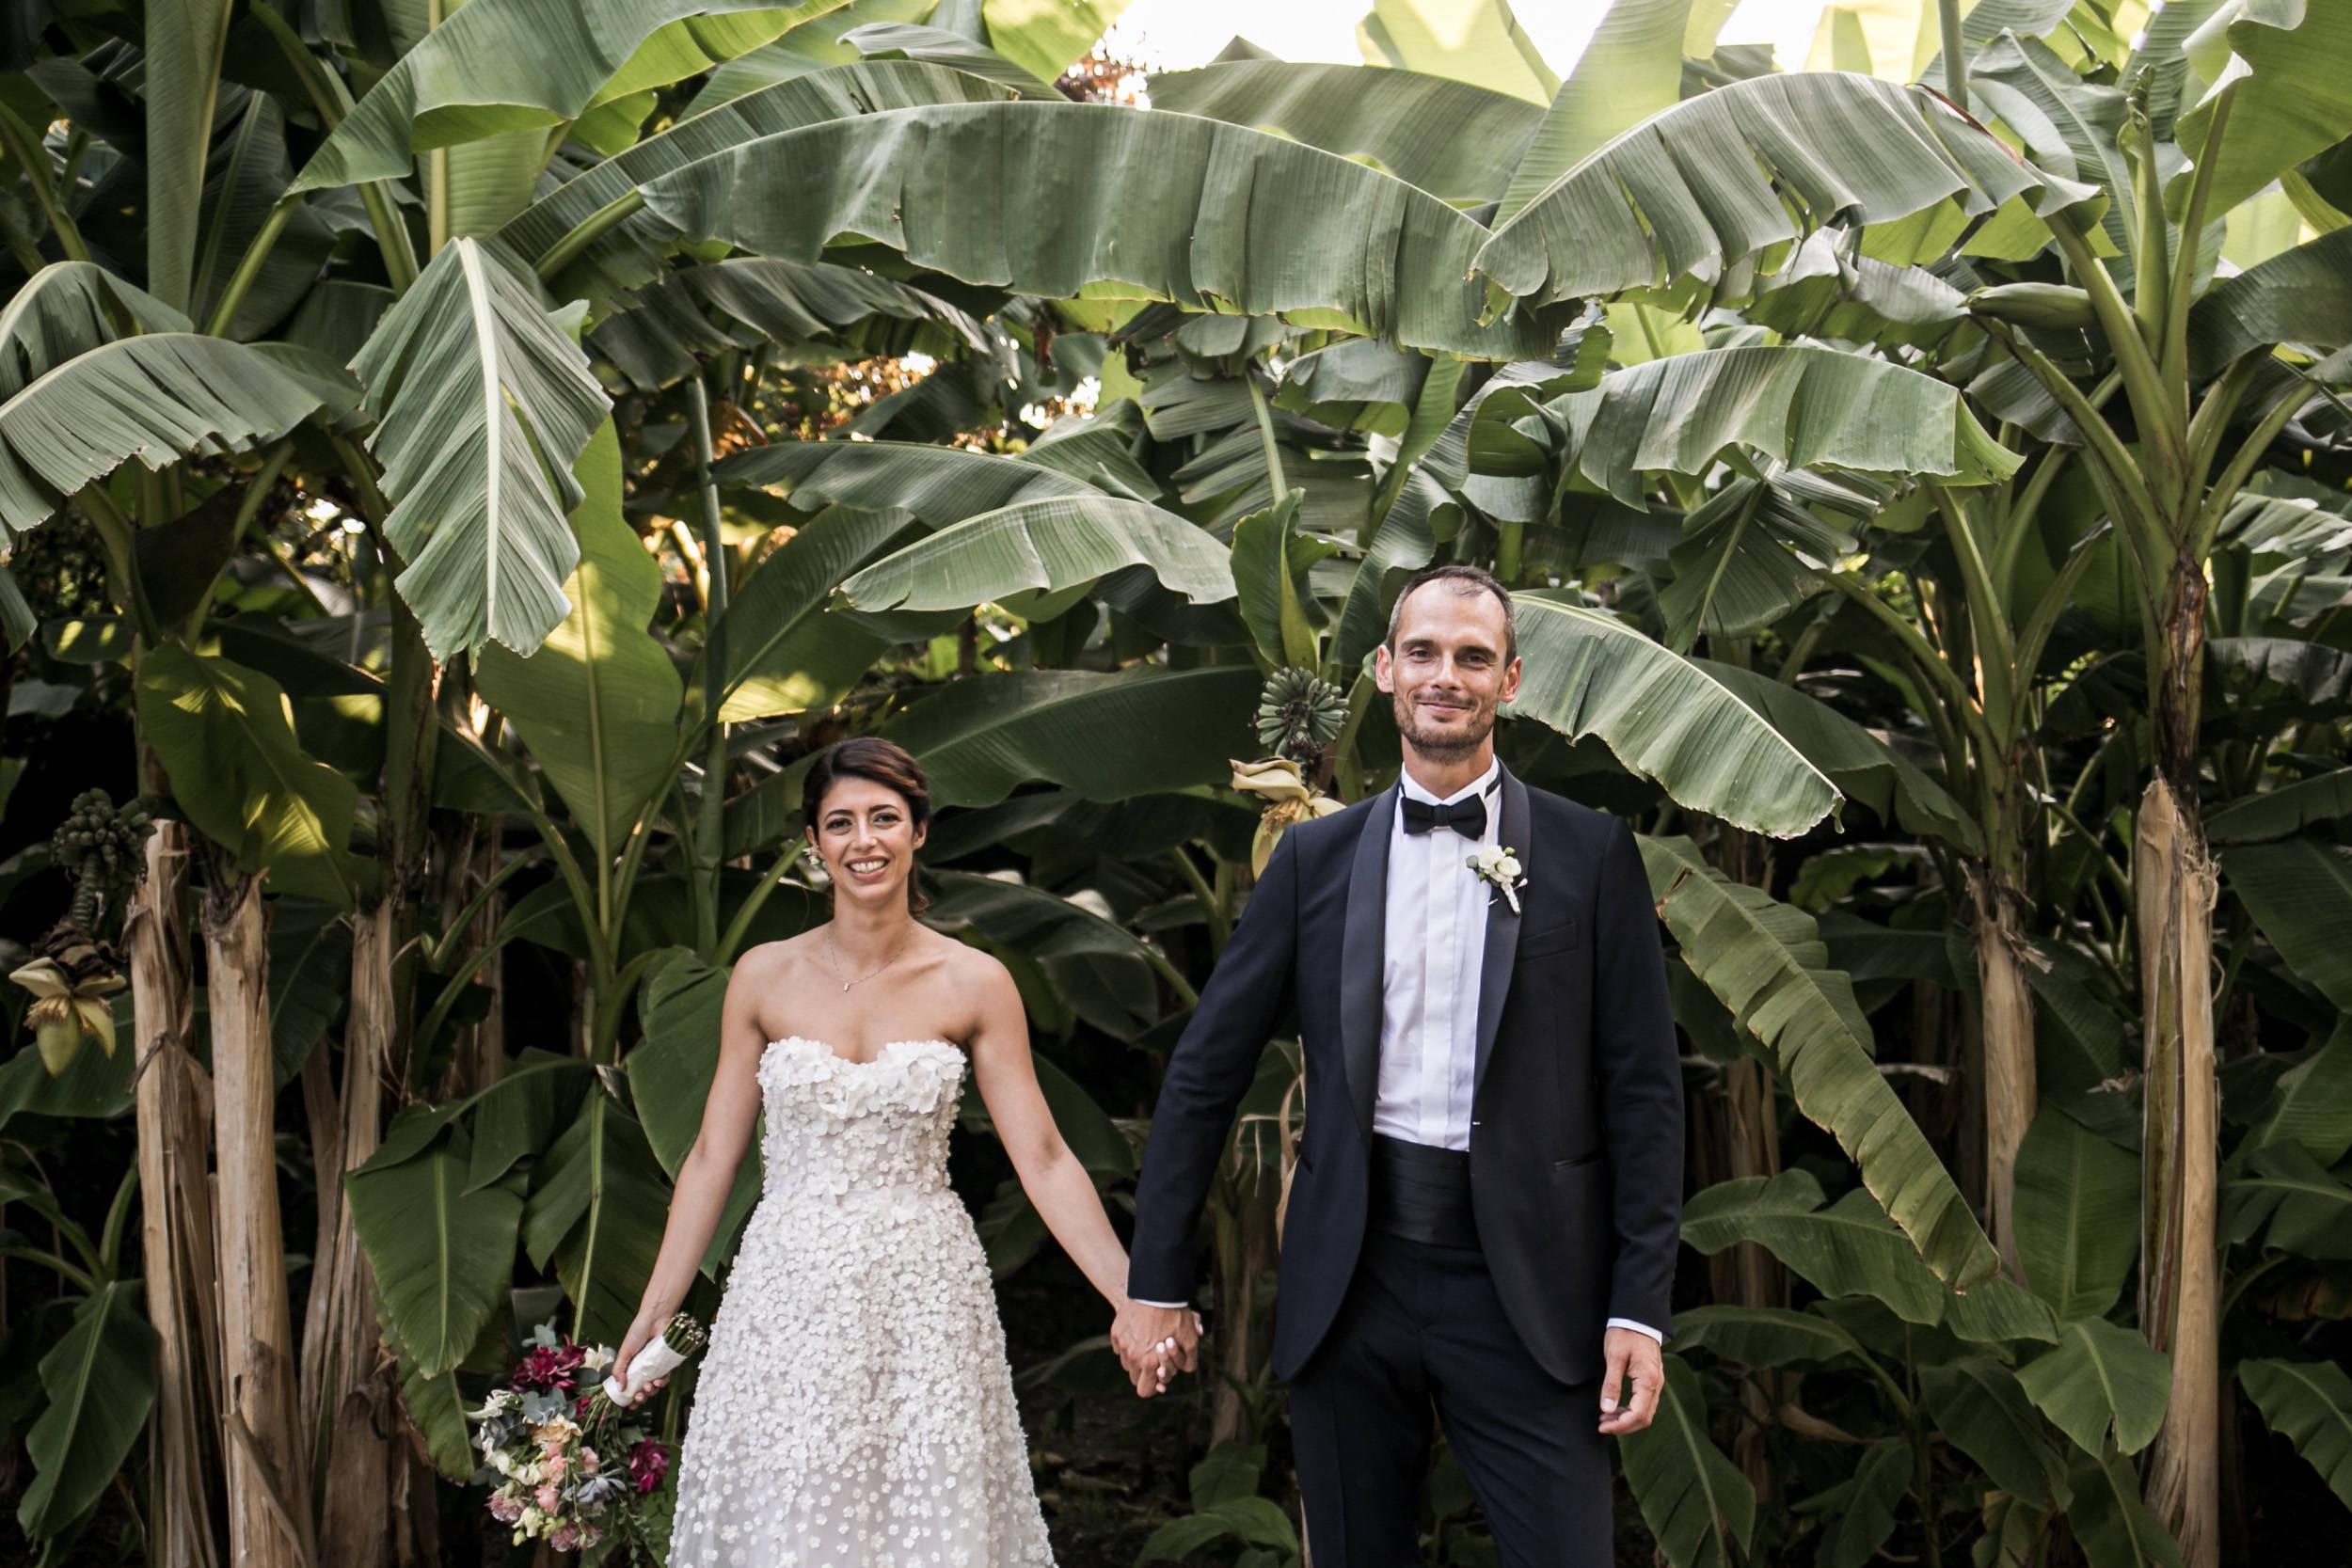 matrimonio_villa-ferrari-gussola_MI-081